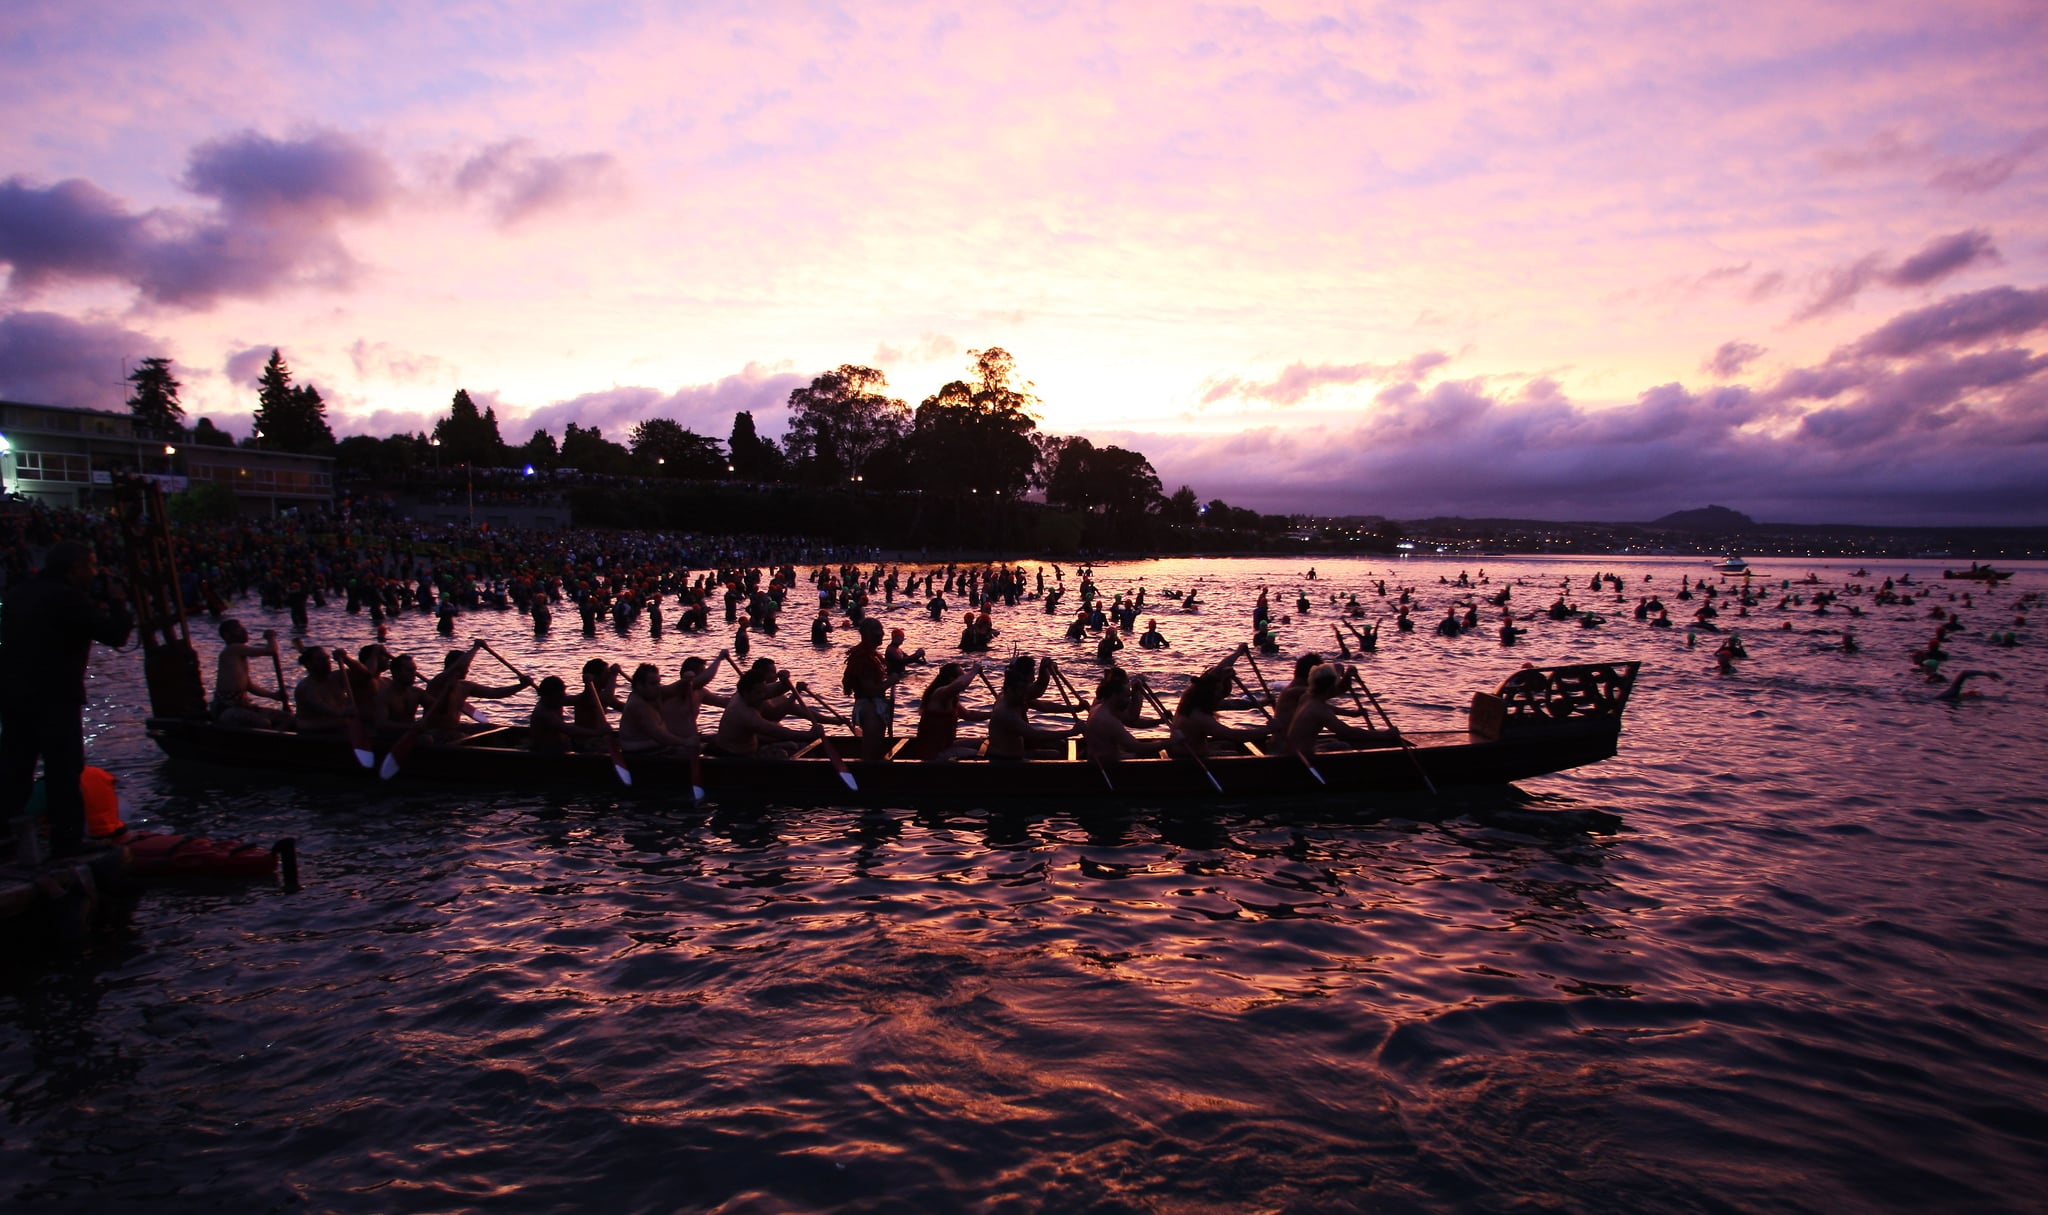 A maori Waka (war canoe) escorts competitors during March's NZ Ironman.